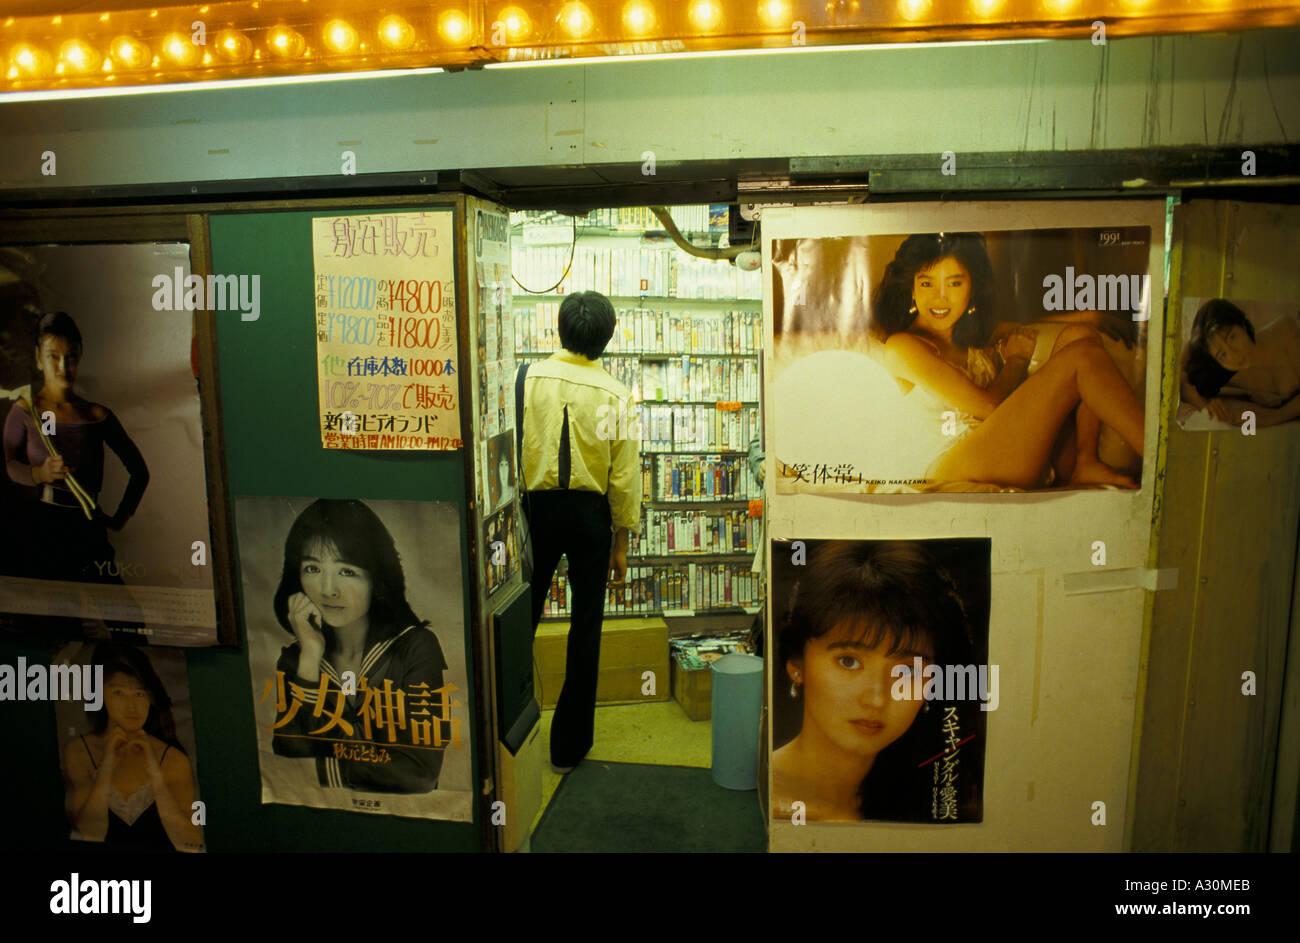 Sex Video Shop Tokyo Japan